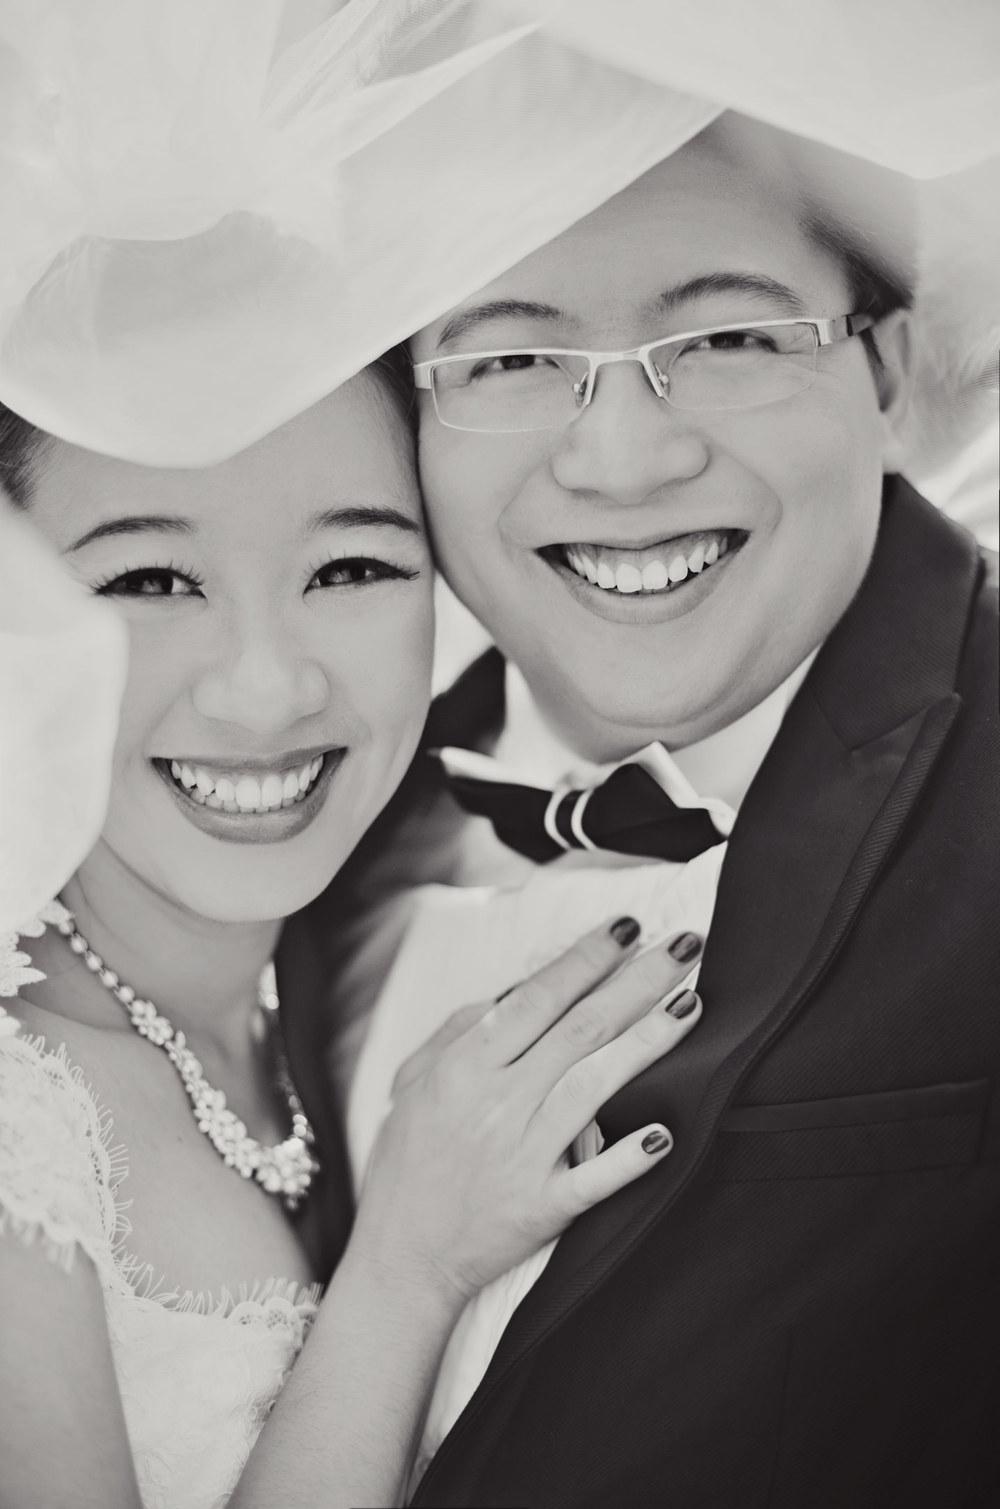 Chris_Hui_Philippine_Bracay_Prewedding_Photography235.jpg